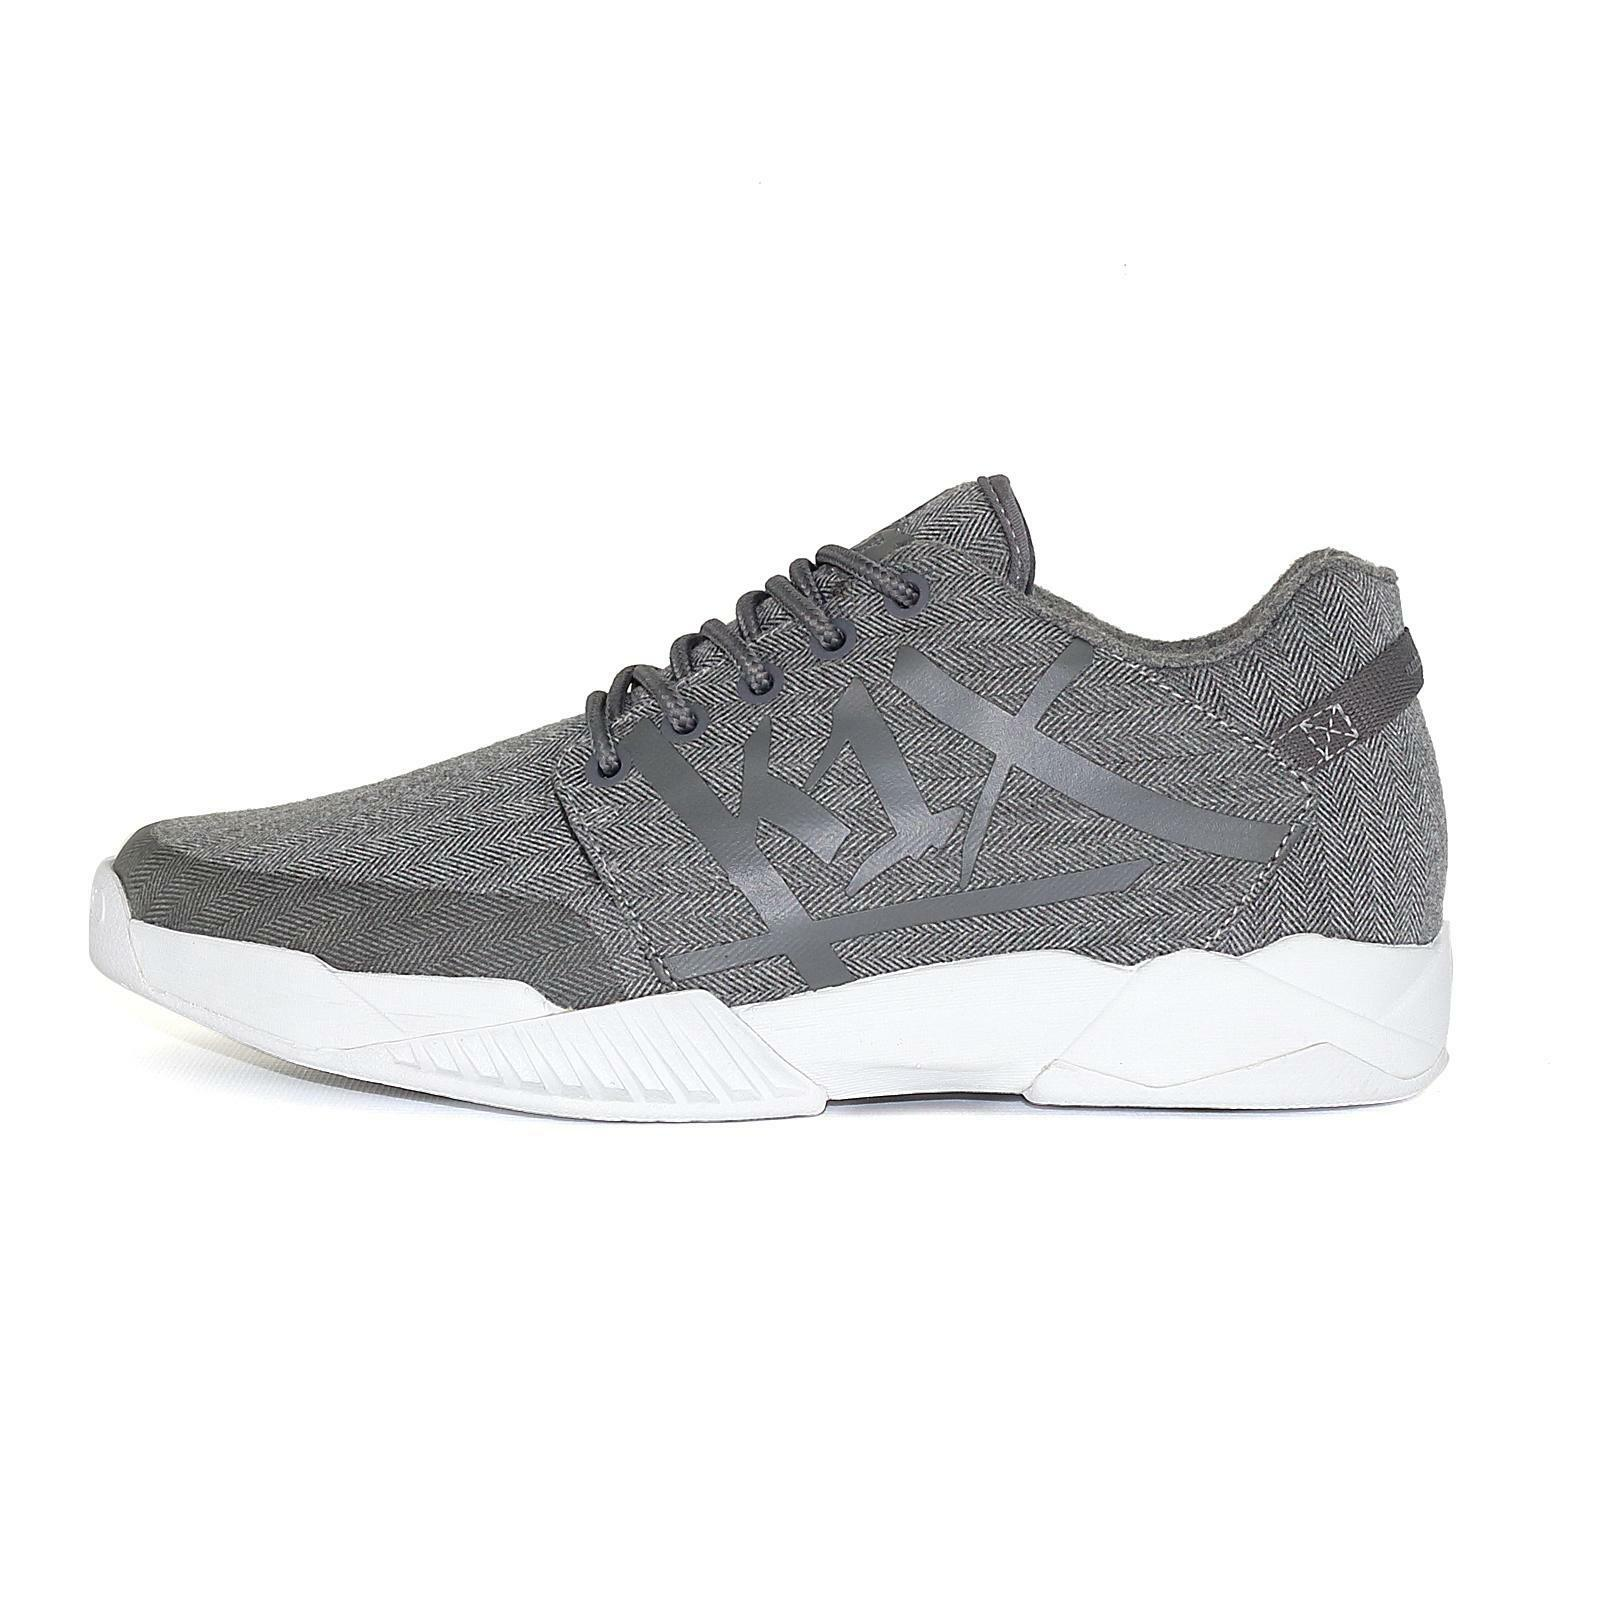 K1X all net light grey herri Sneaker Herren Schuhe hellgrau meliert 51005